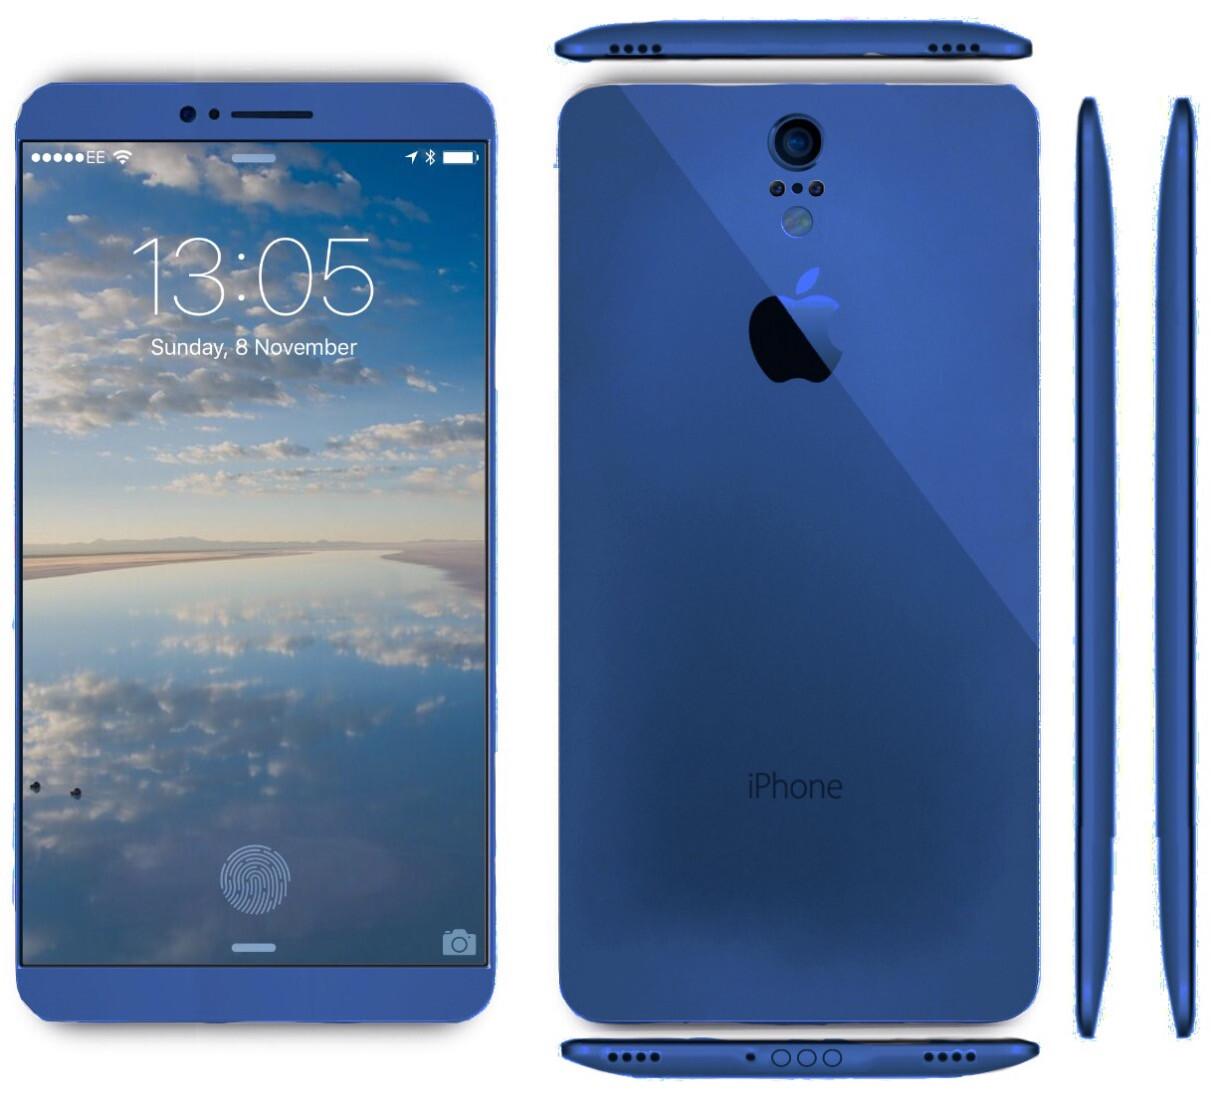 Original Unlocked Apple iPhone SE Cell Phone 4G LTE 4.0